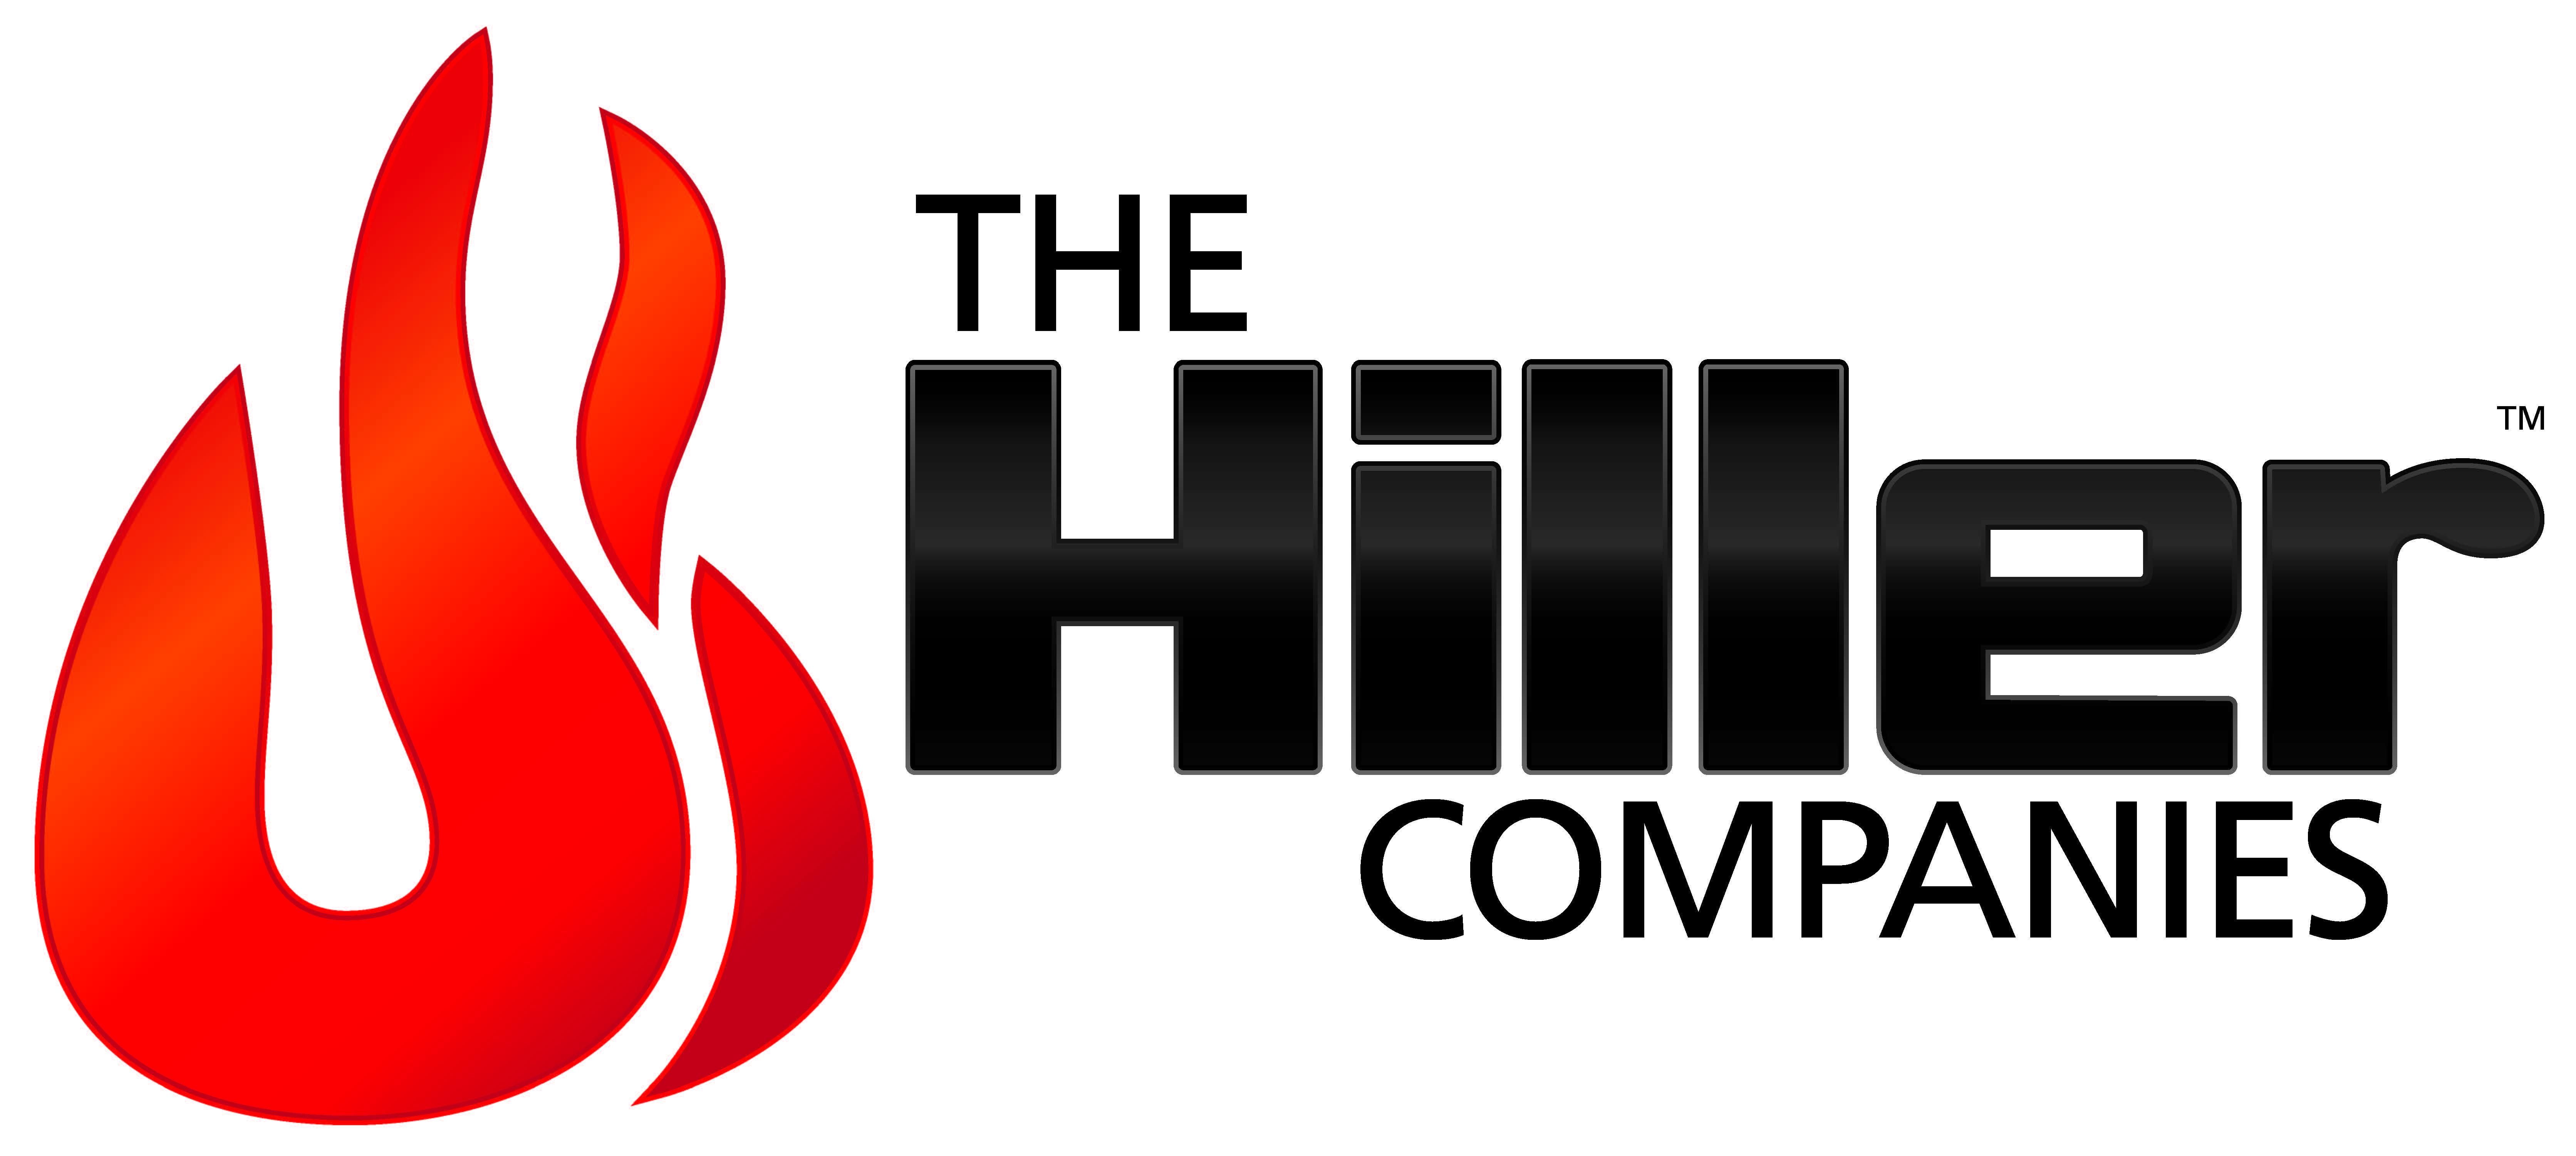 MARINE FIRE TECHNICIAN job in Houston at Hiller Companies